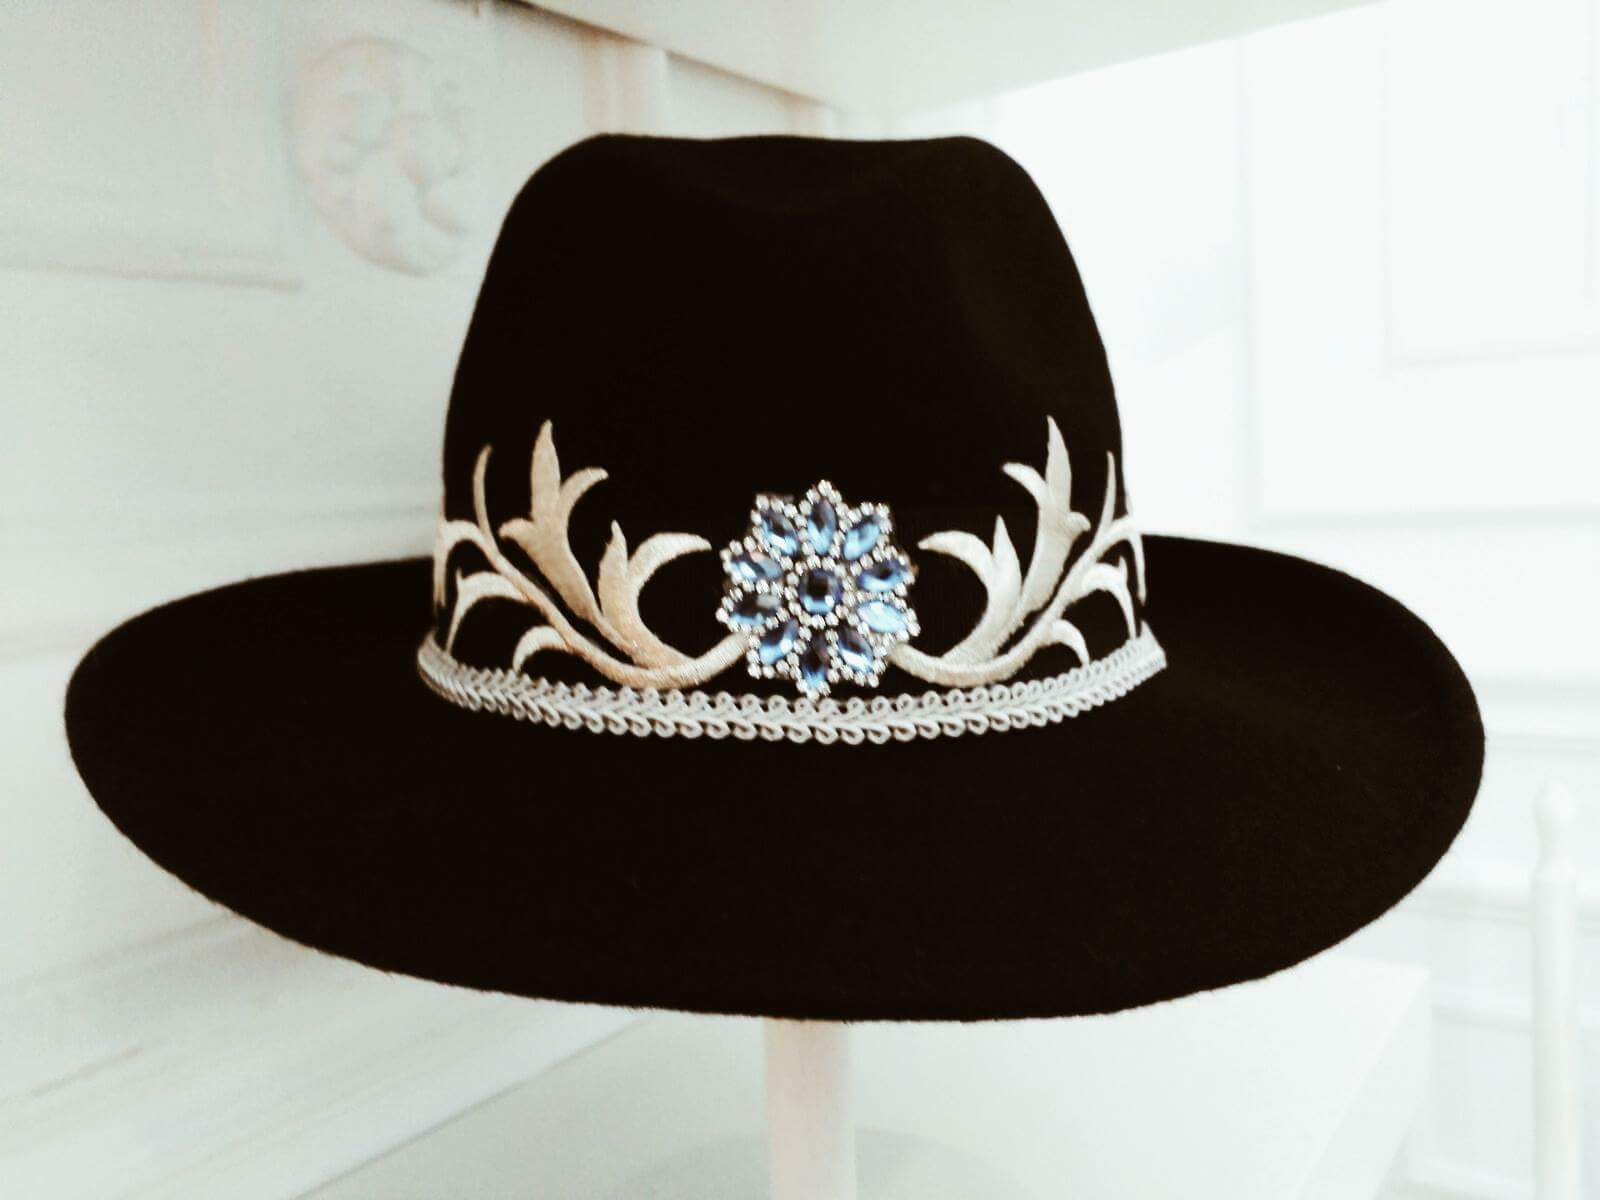 Felt hats at LaMotto